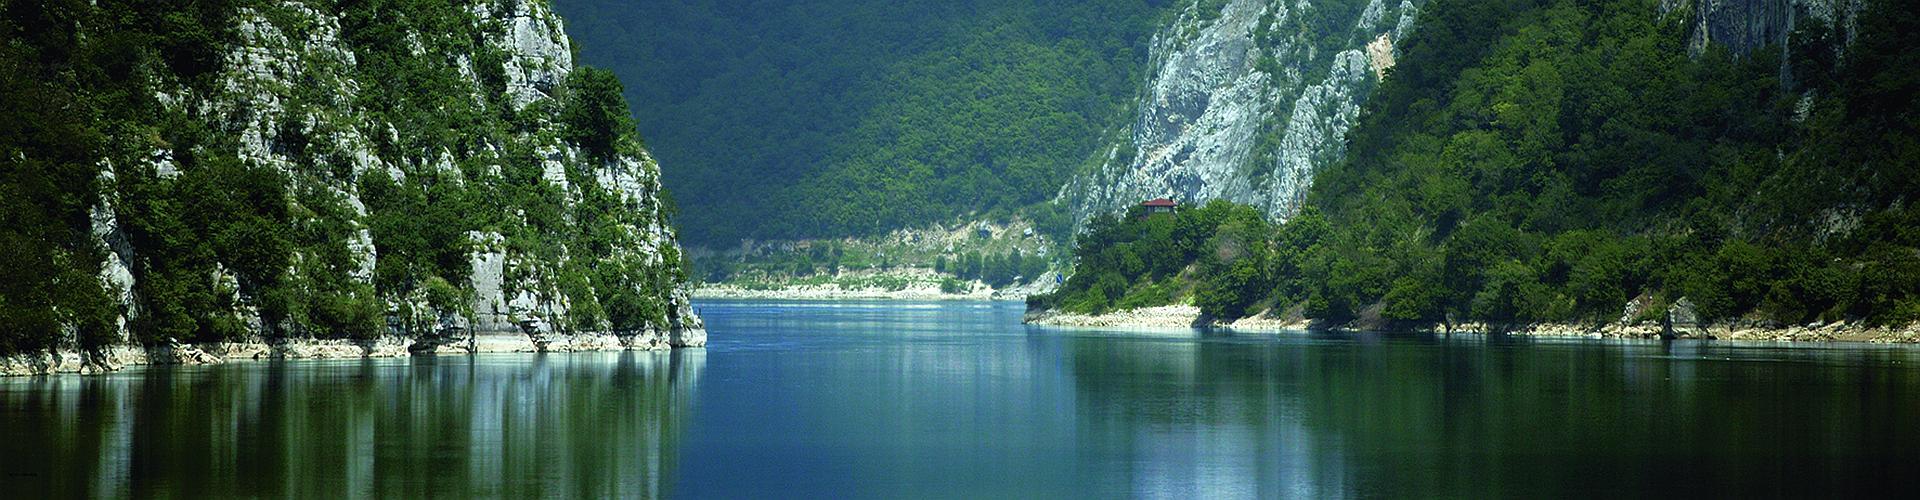 Katarakte an der Donau